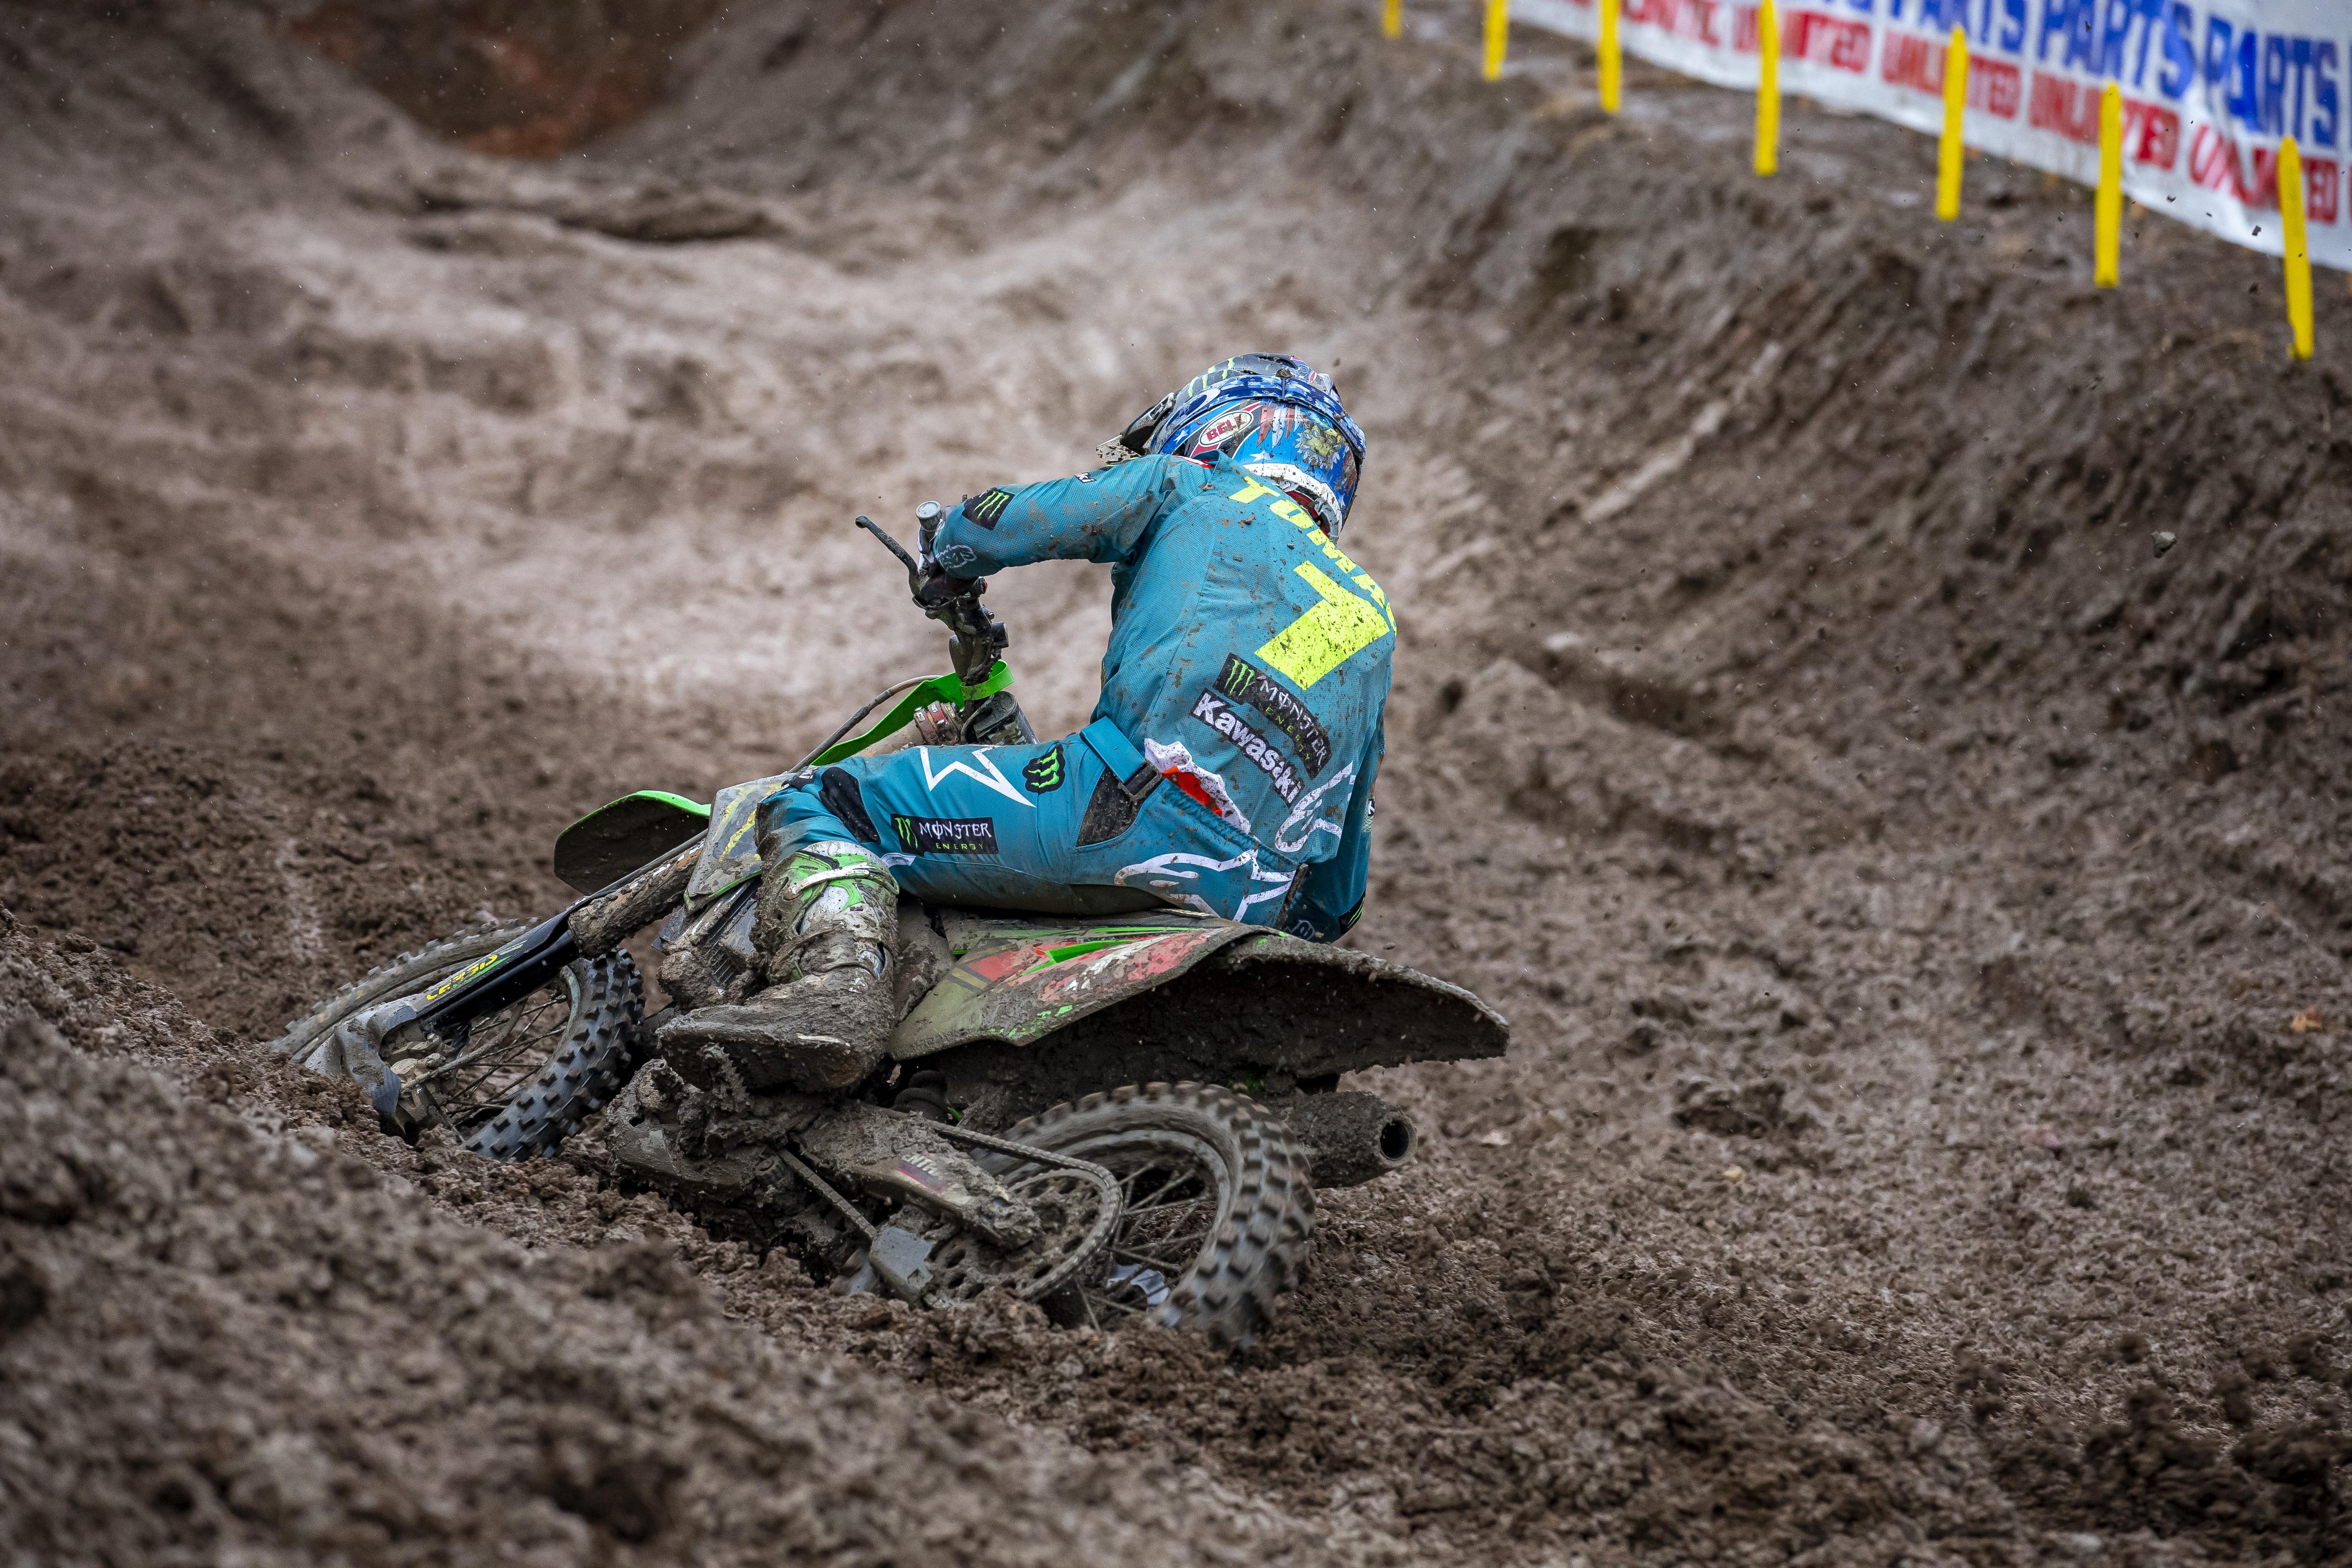 2019 Hangtown Motocross Classic Pictures